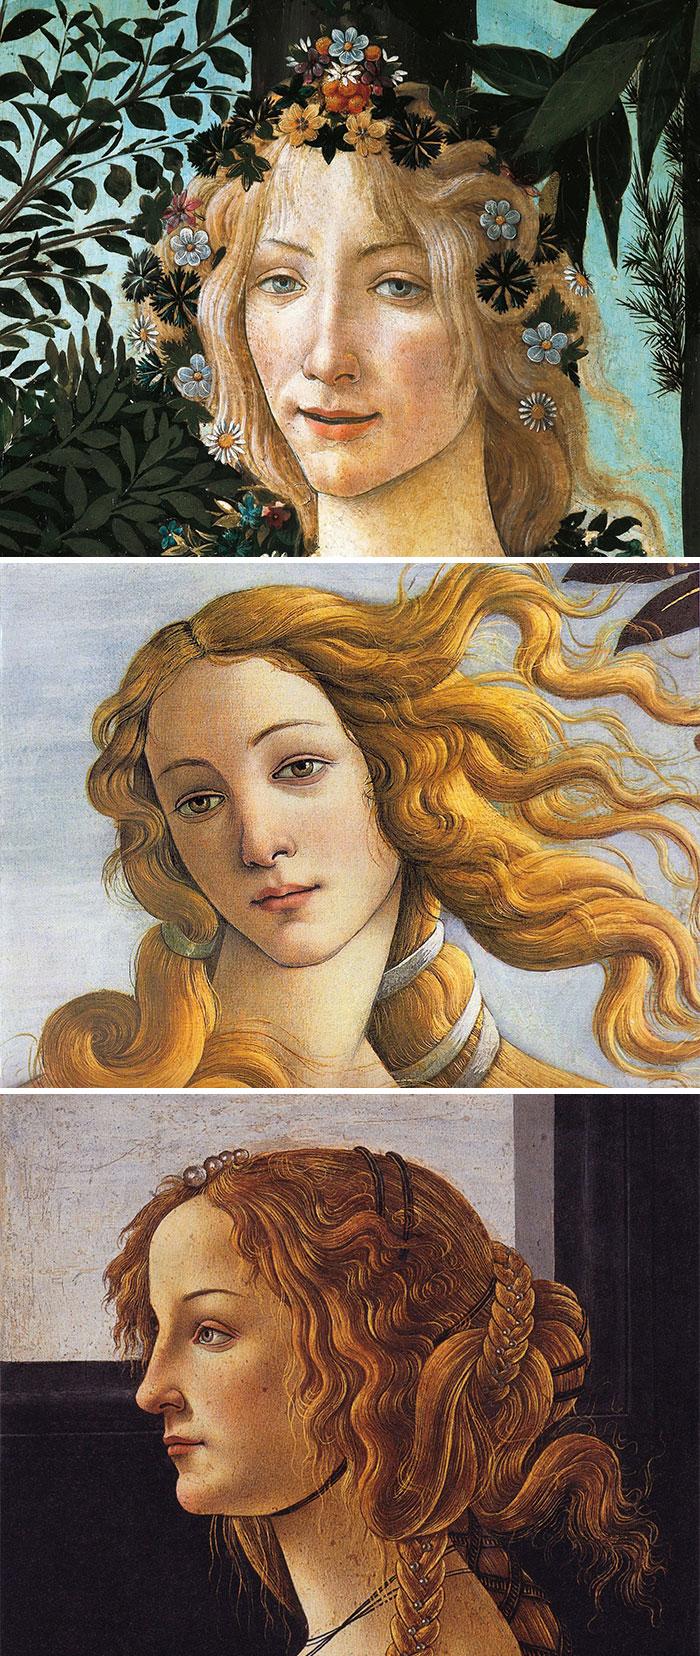 art-movement-style-paintings-descriptions-60b0981c870a3__700.jpg